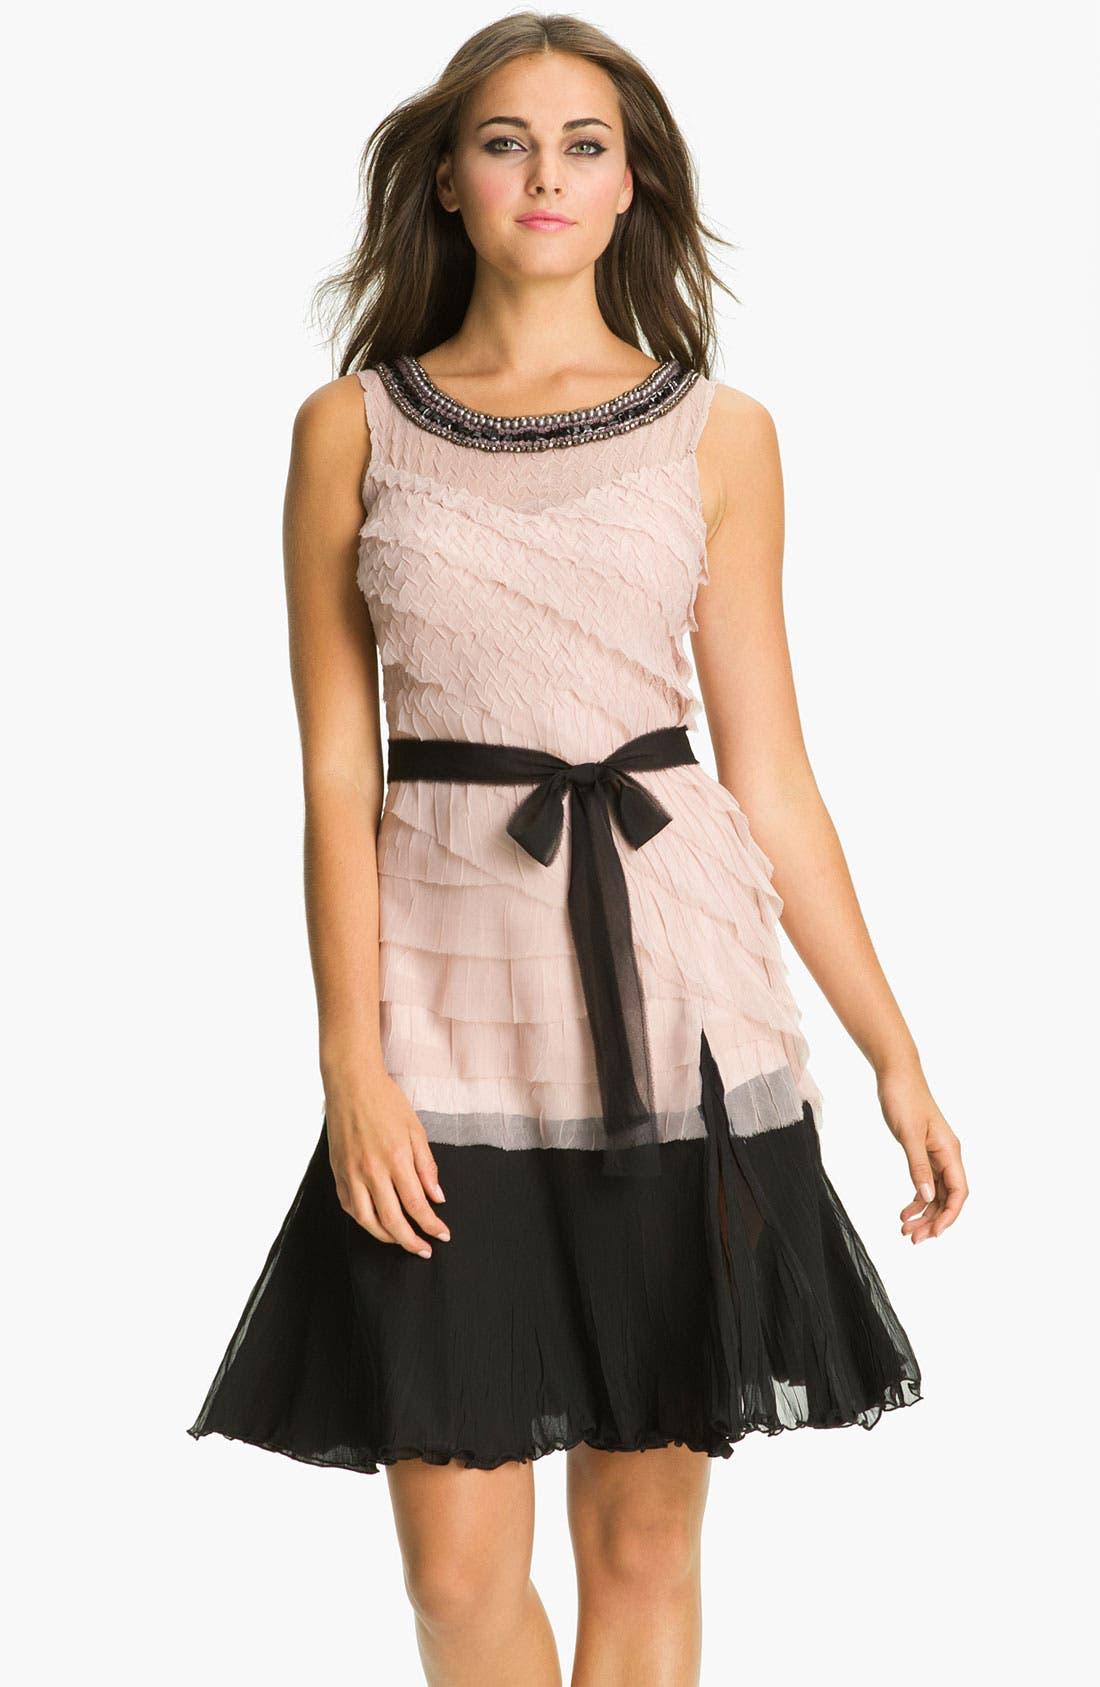 Alternate Image 1 Selected - Black by Komarov Embellished Collar Layered Chiffon Dress